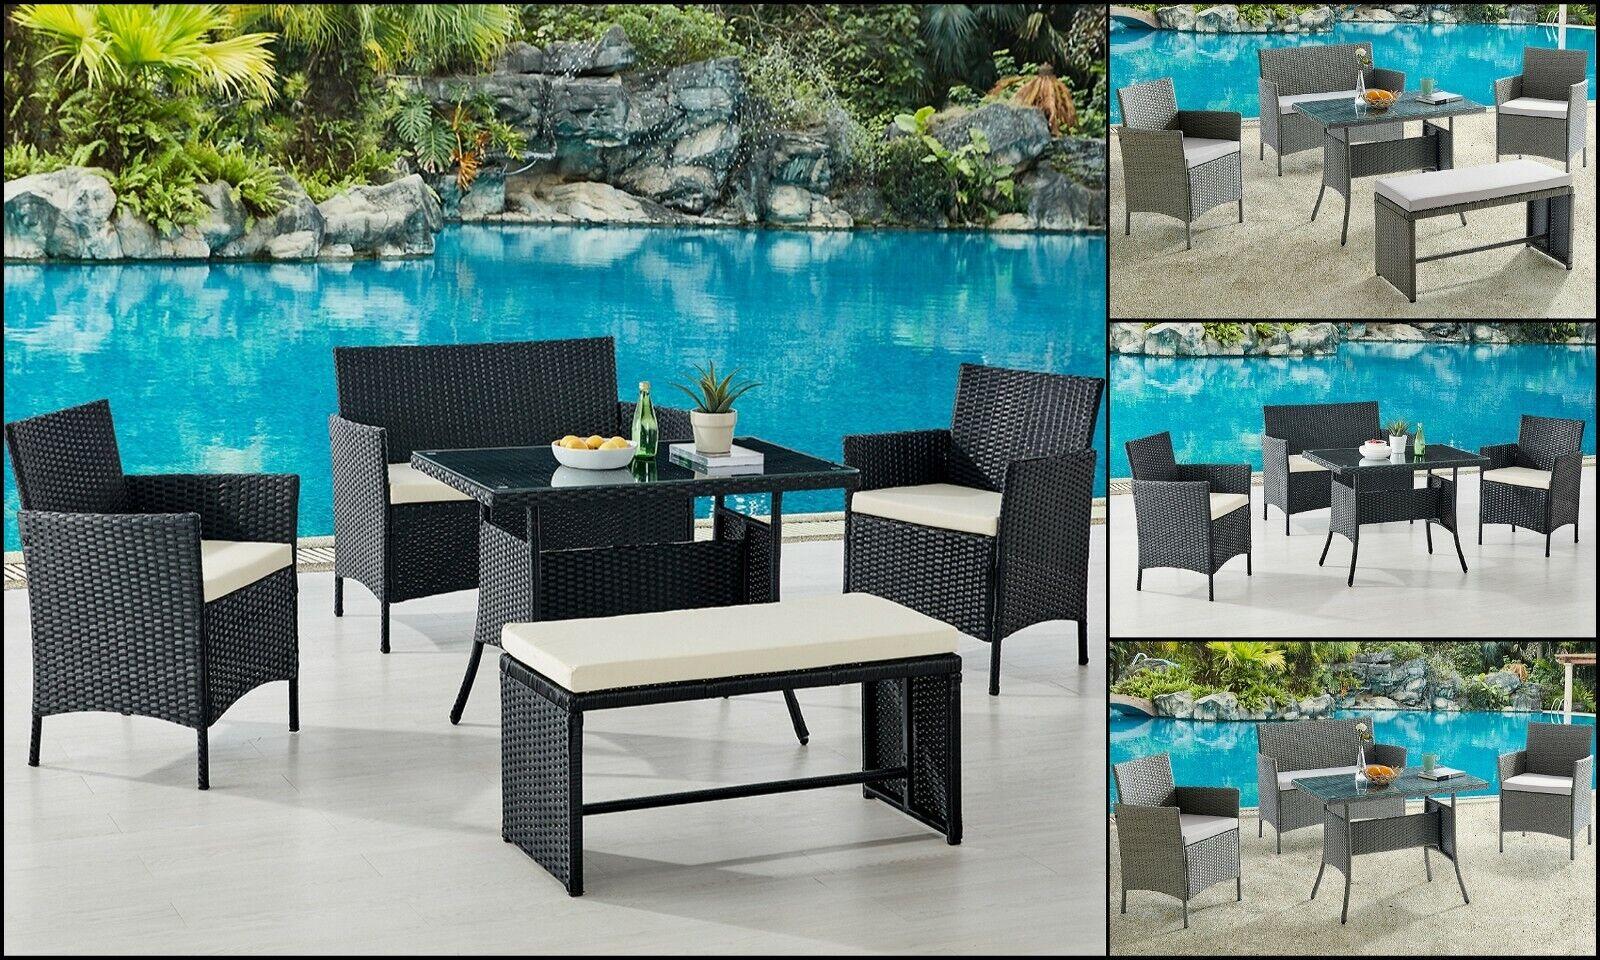 Garden Furniture - Rattan Garden Furniture Set Outdoor Dining Table Chair Optional Bench Grey Black